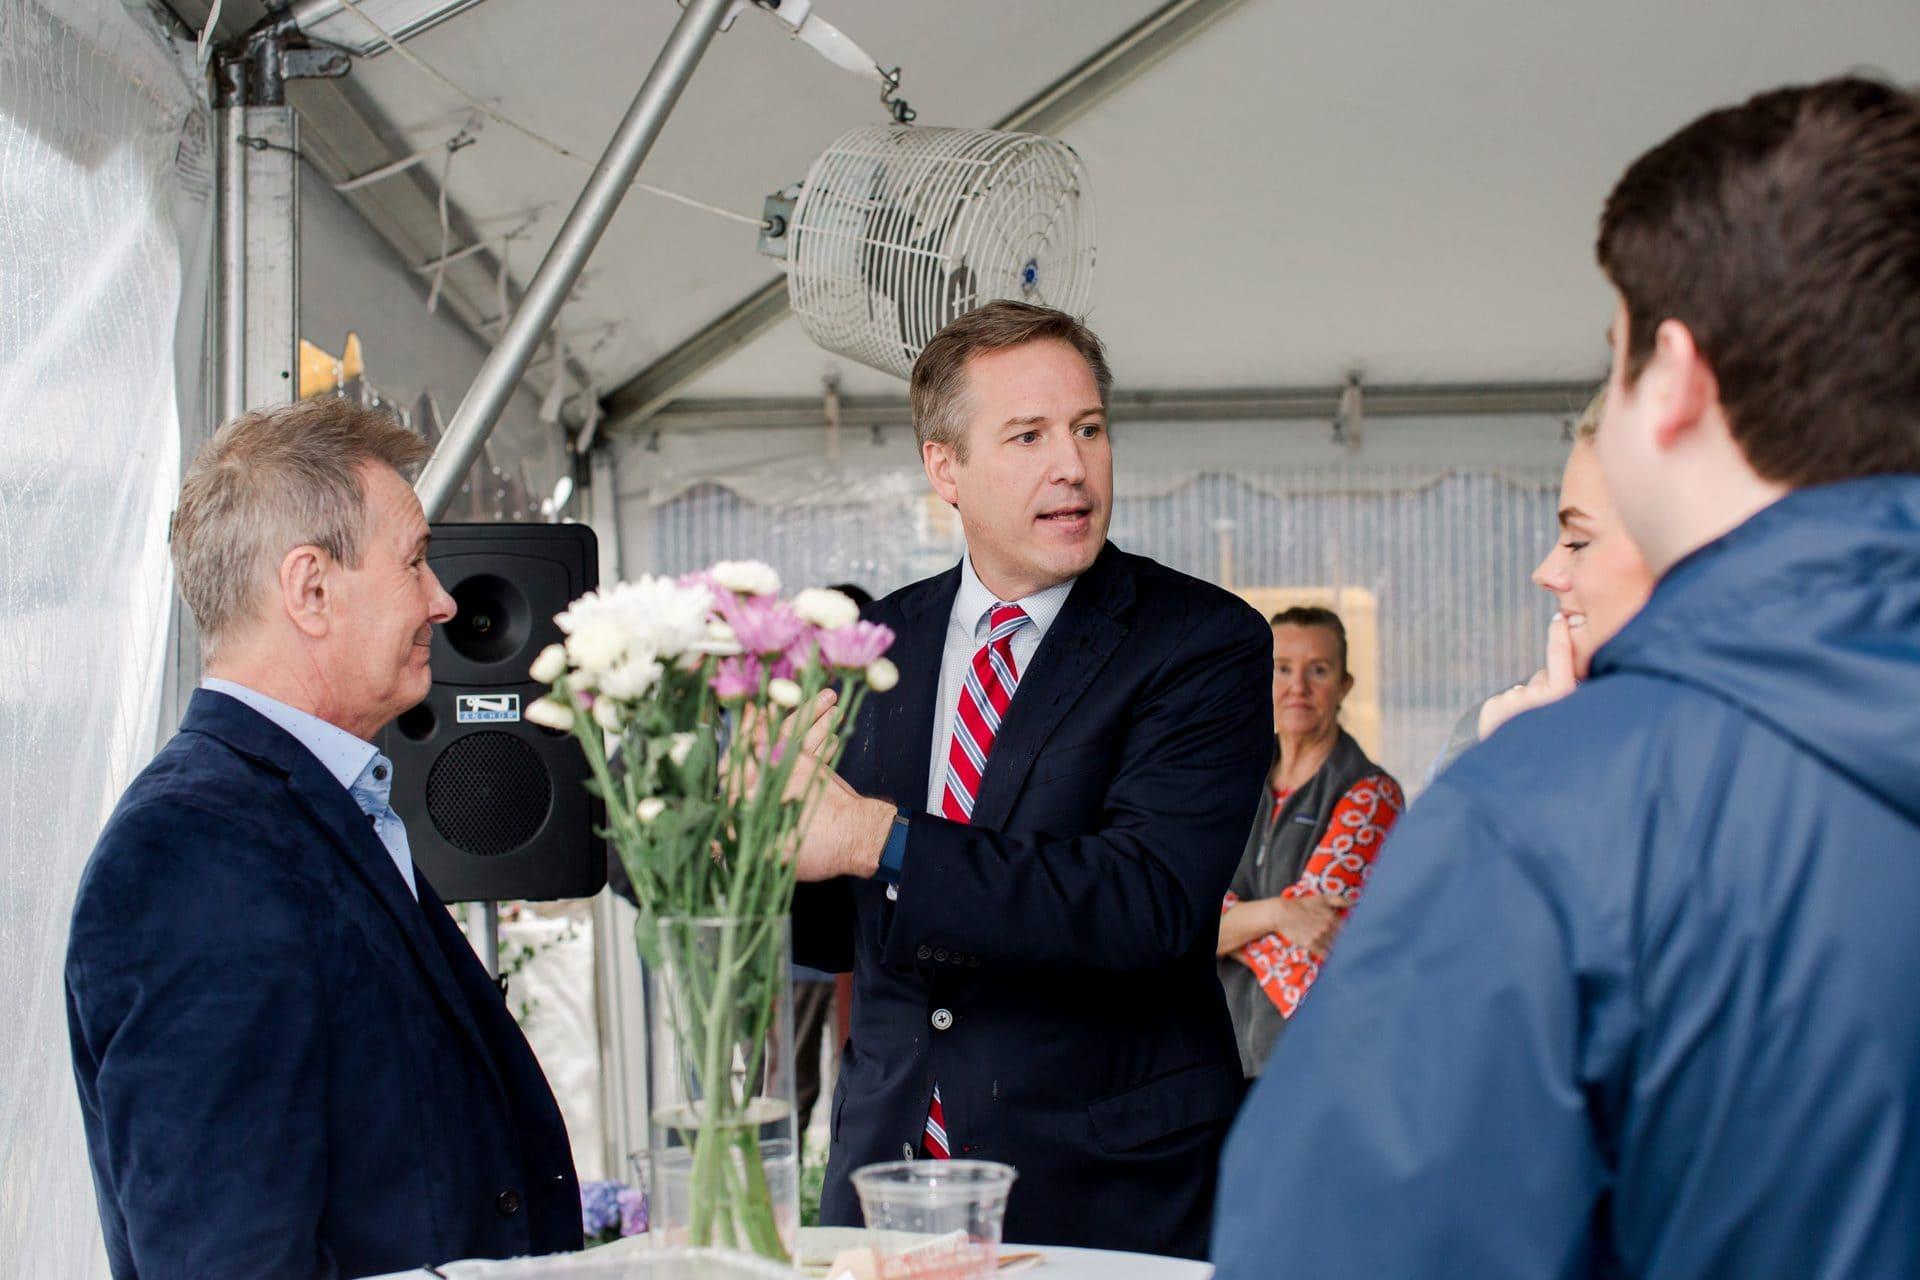 men talking at event